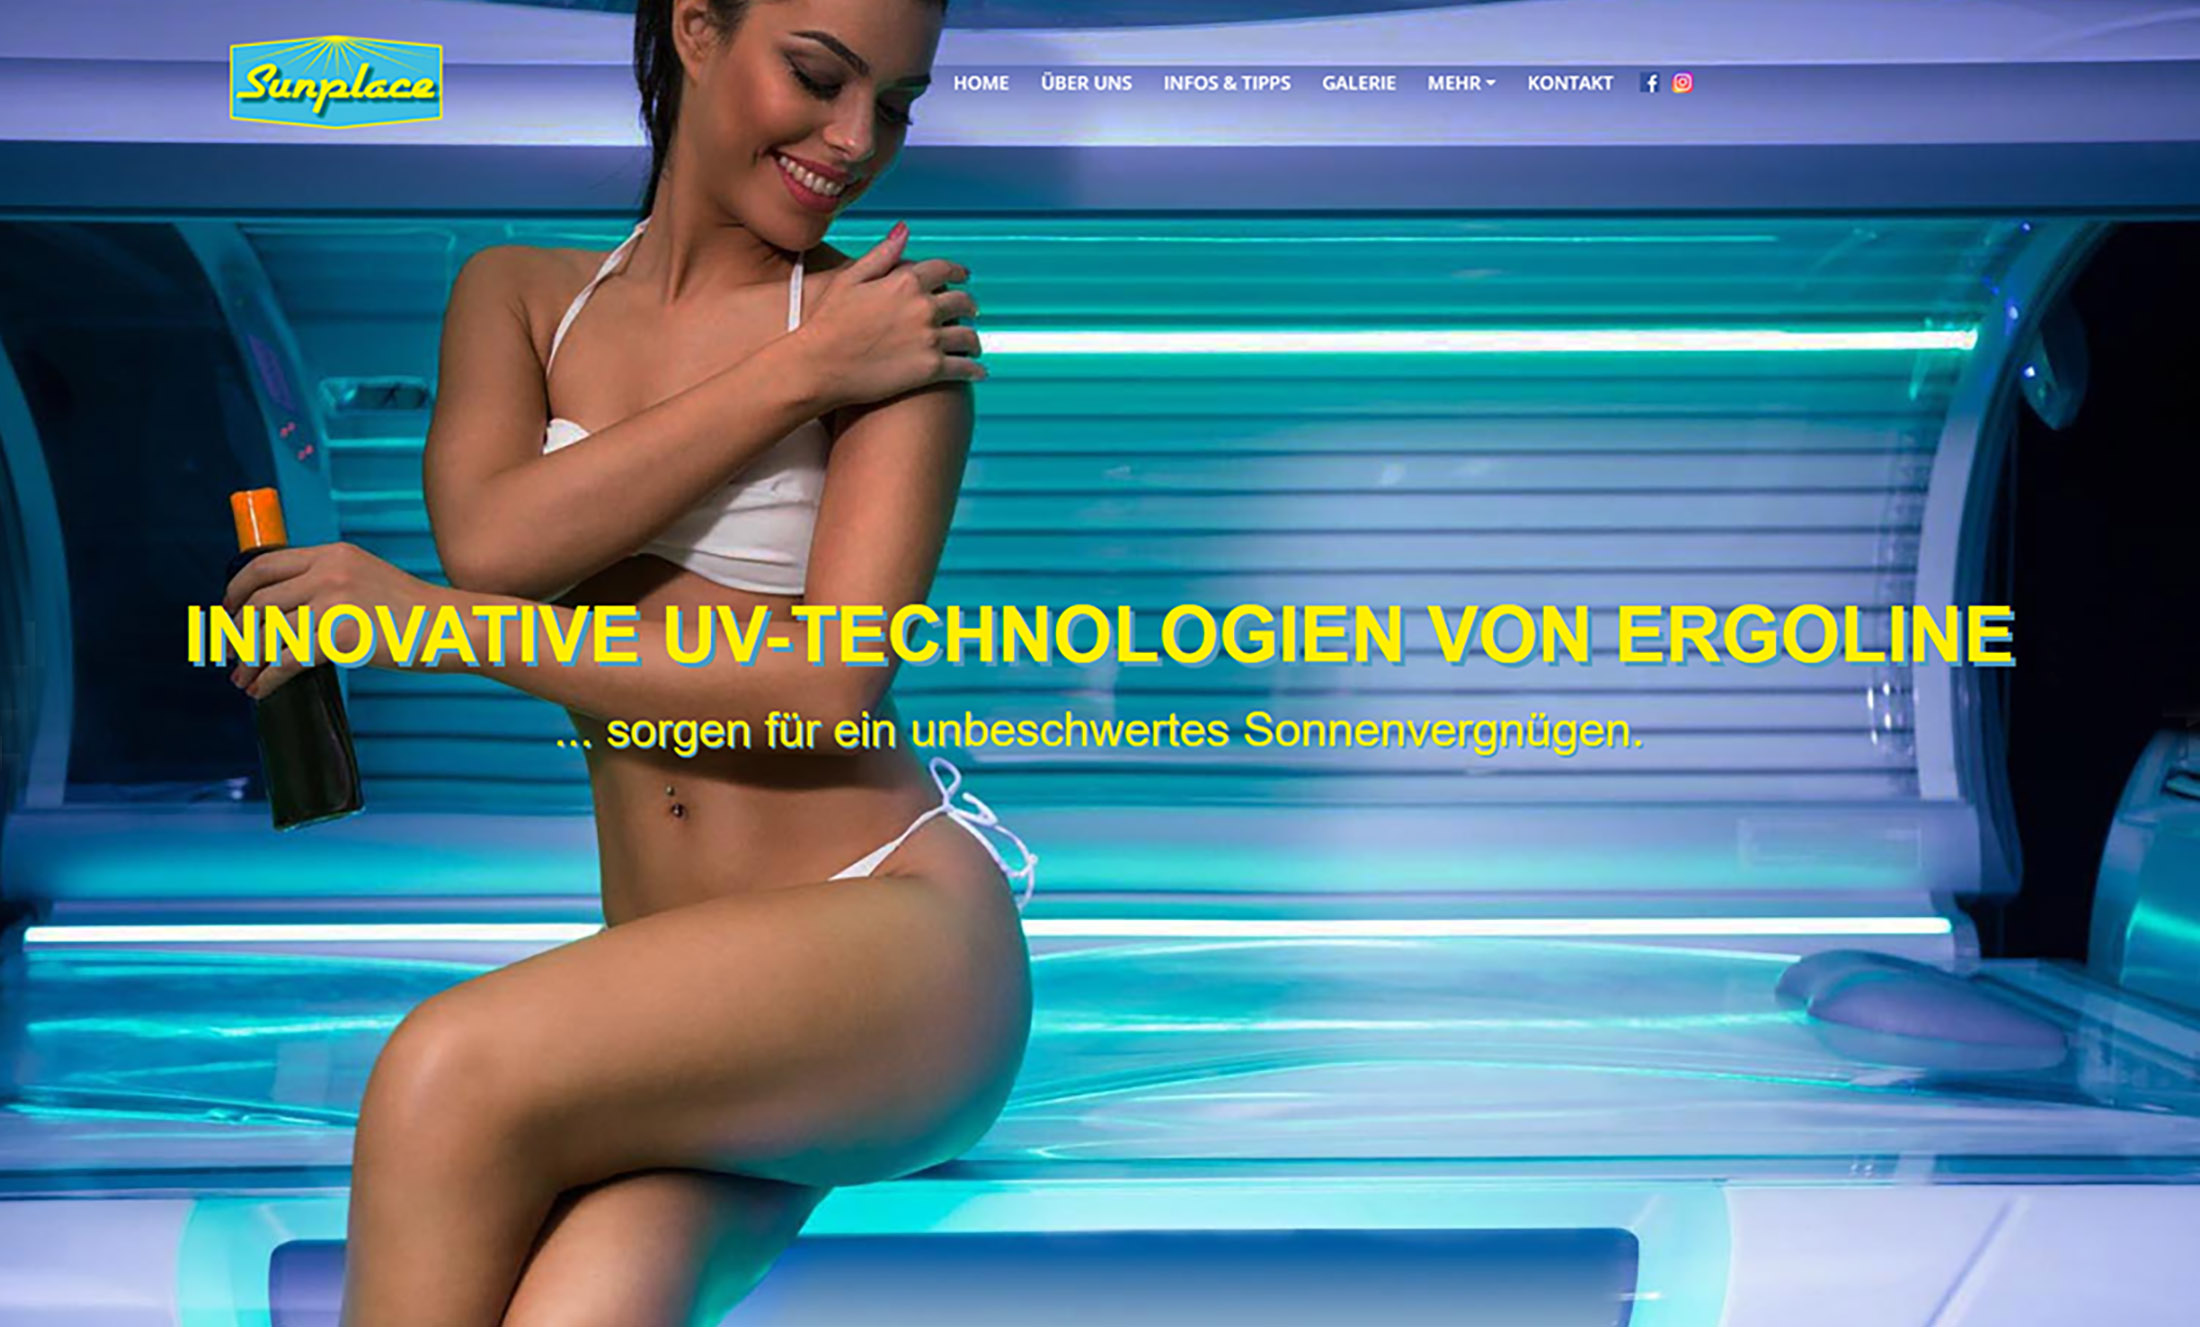 werbeagentur -2 design-meets-web-web-grafik-print-werbetechnik-muenchen-markt schwaben